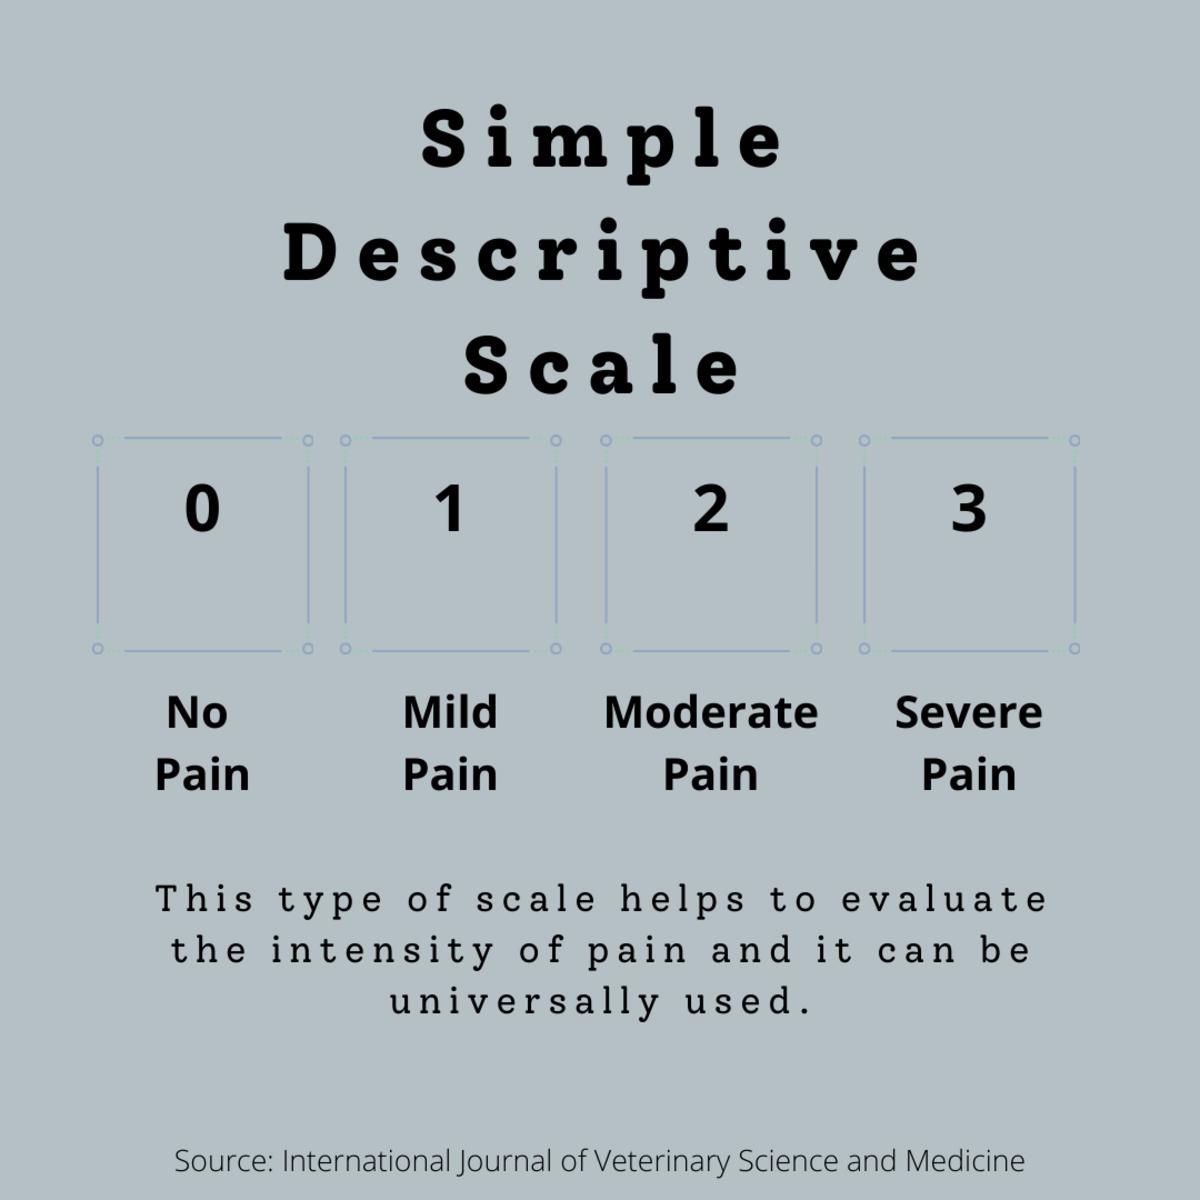 Diagram of  a simple descriptive scale used for feline pain management.